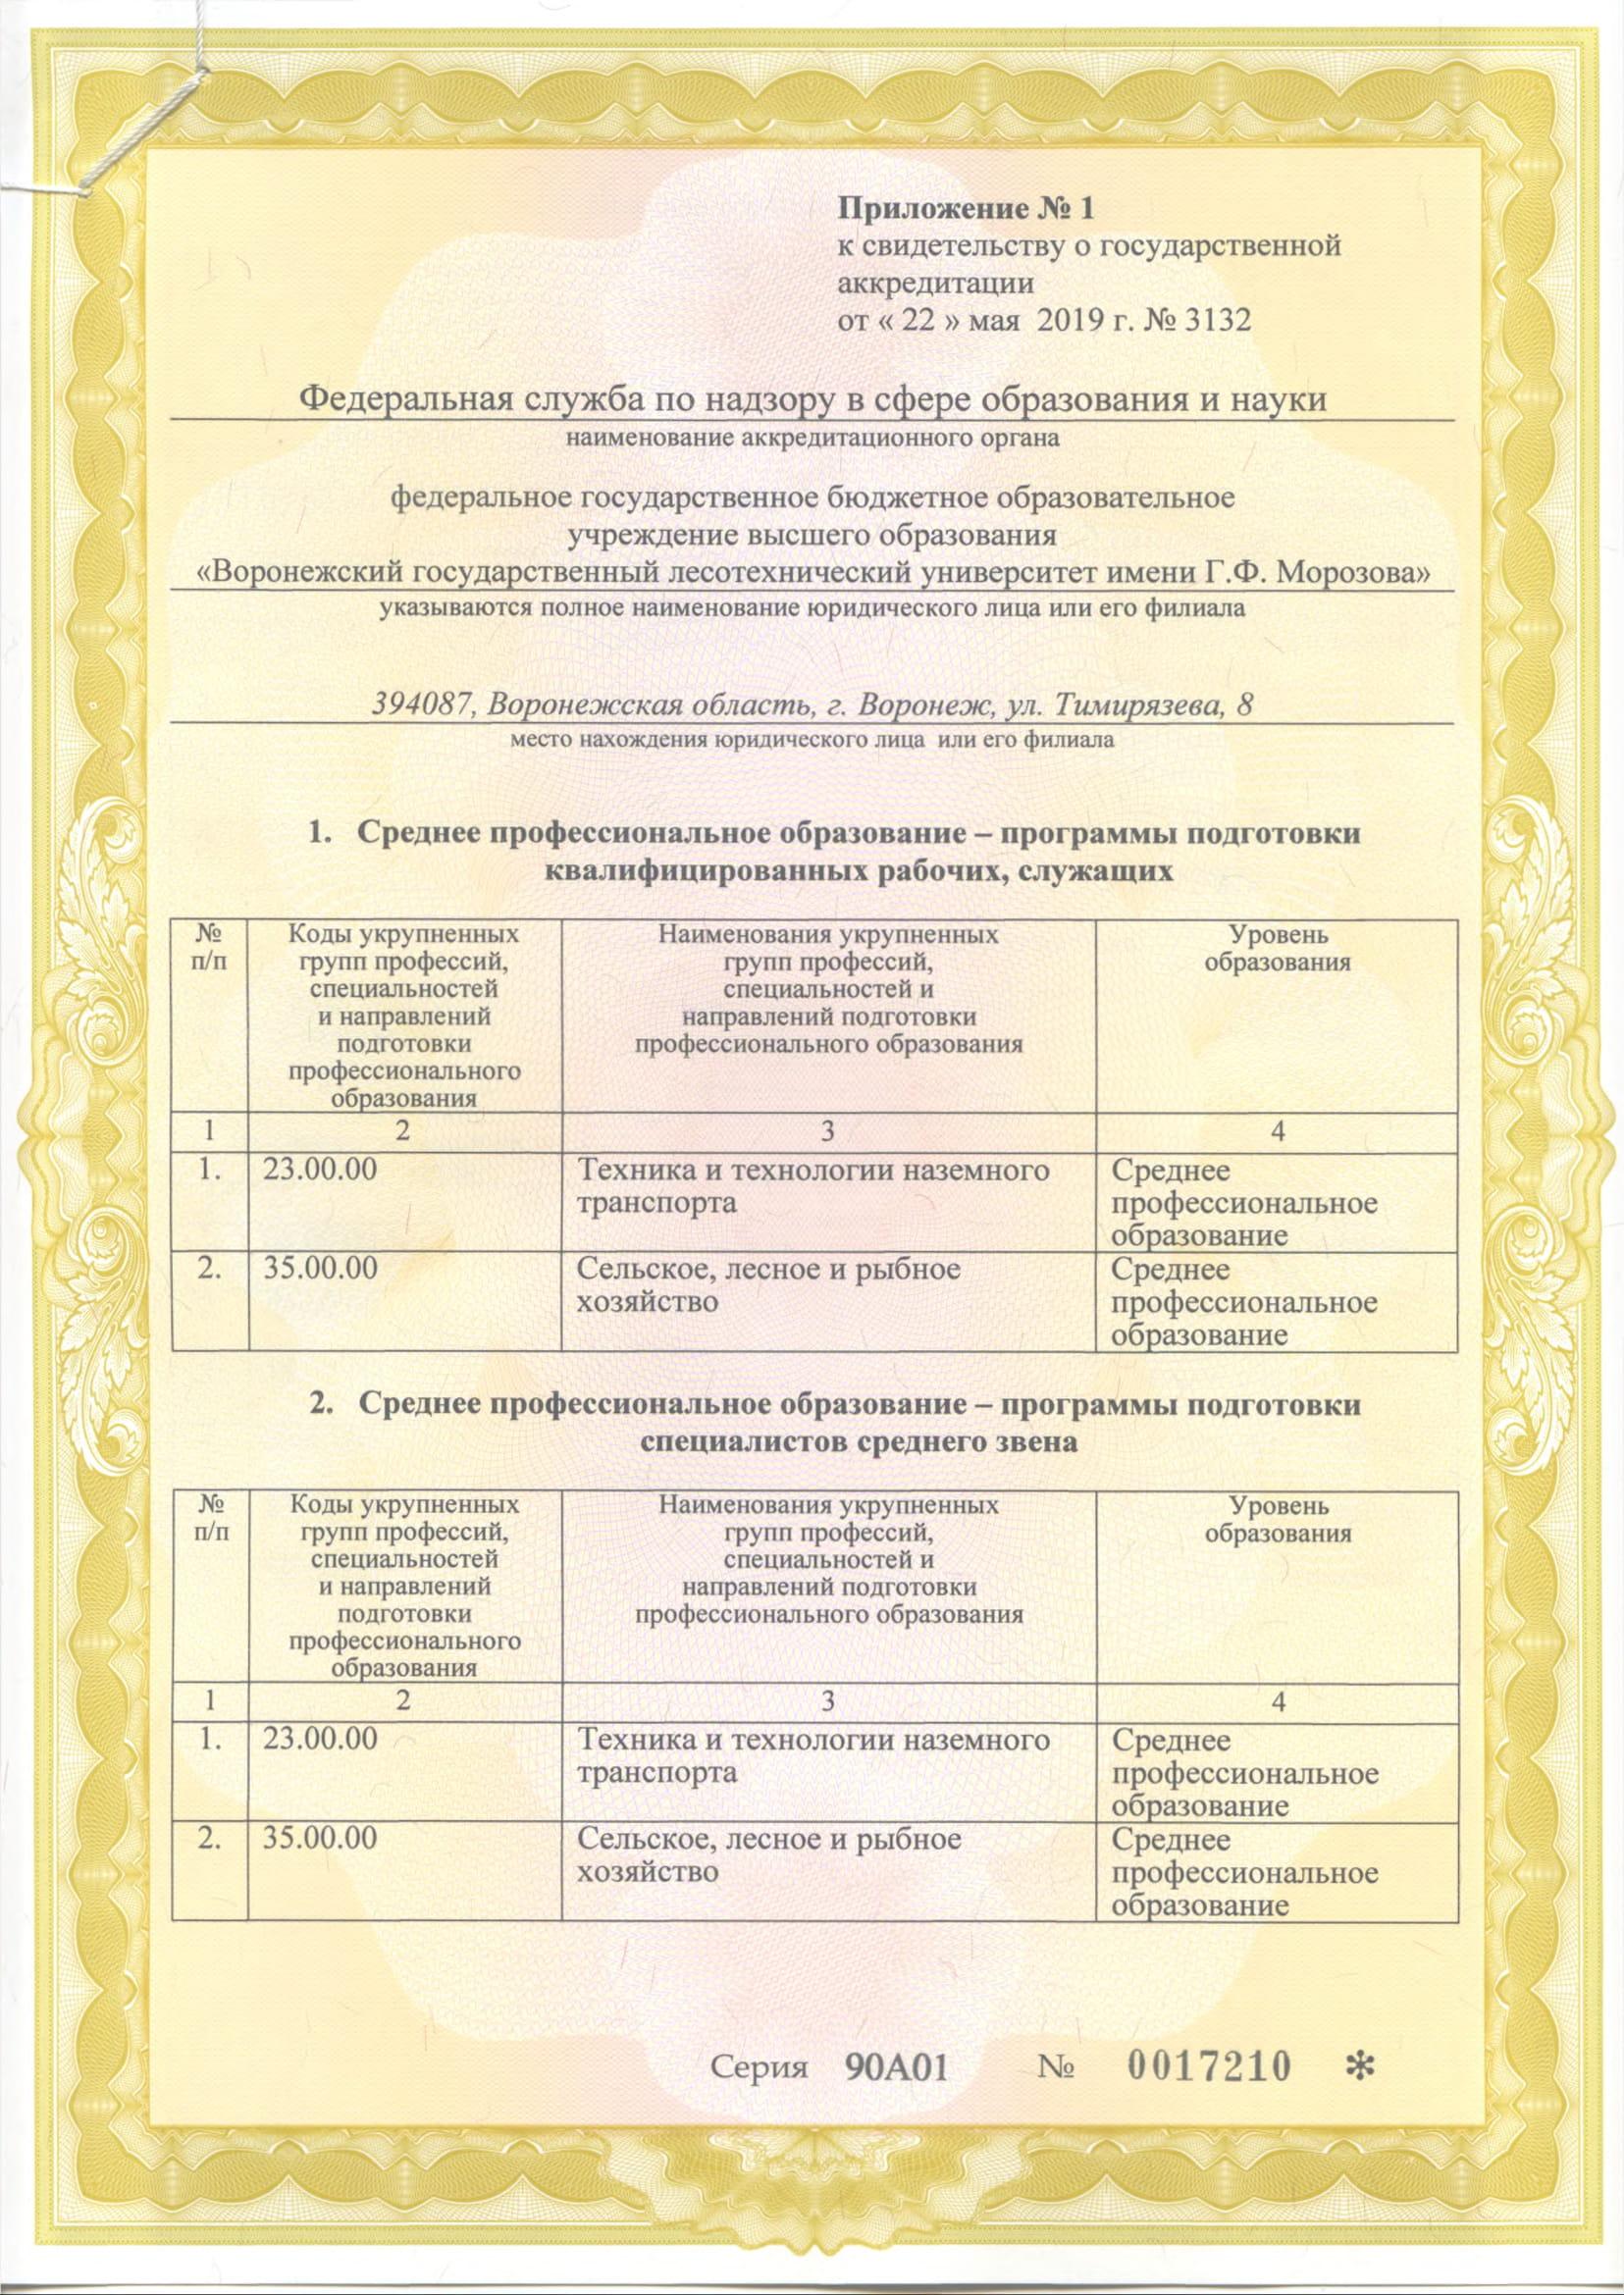 http://departamentvpo.ru/wp-content/uploads/2019/06/prilozhenie-k-akkreditacii_22.05.19-1.jpg